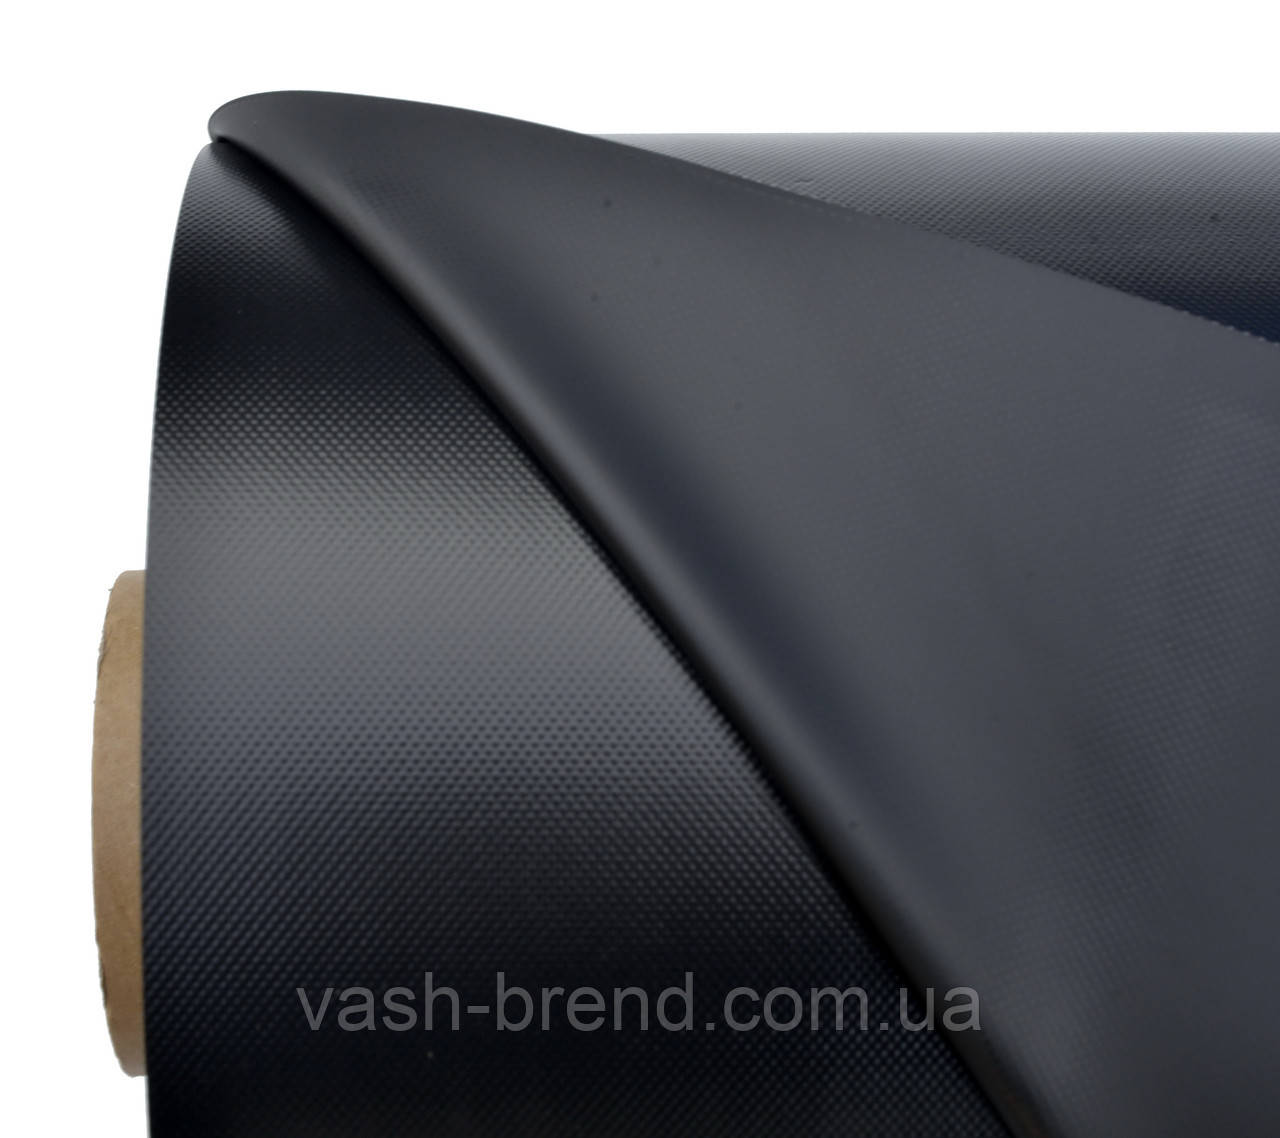 Ткань ПВХ (PVC) 50х2,05м черный, 950гр рулон